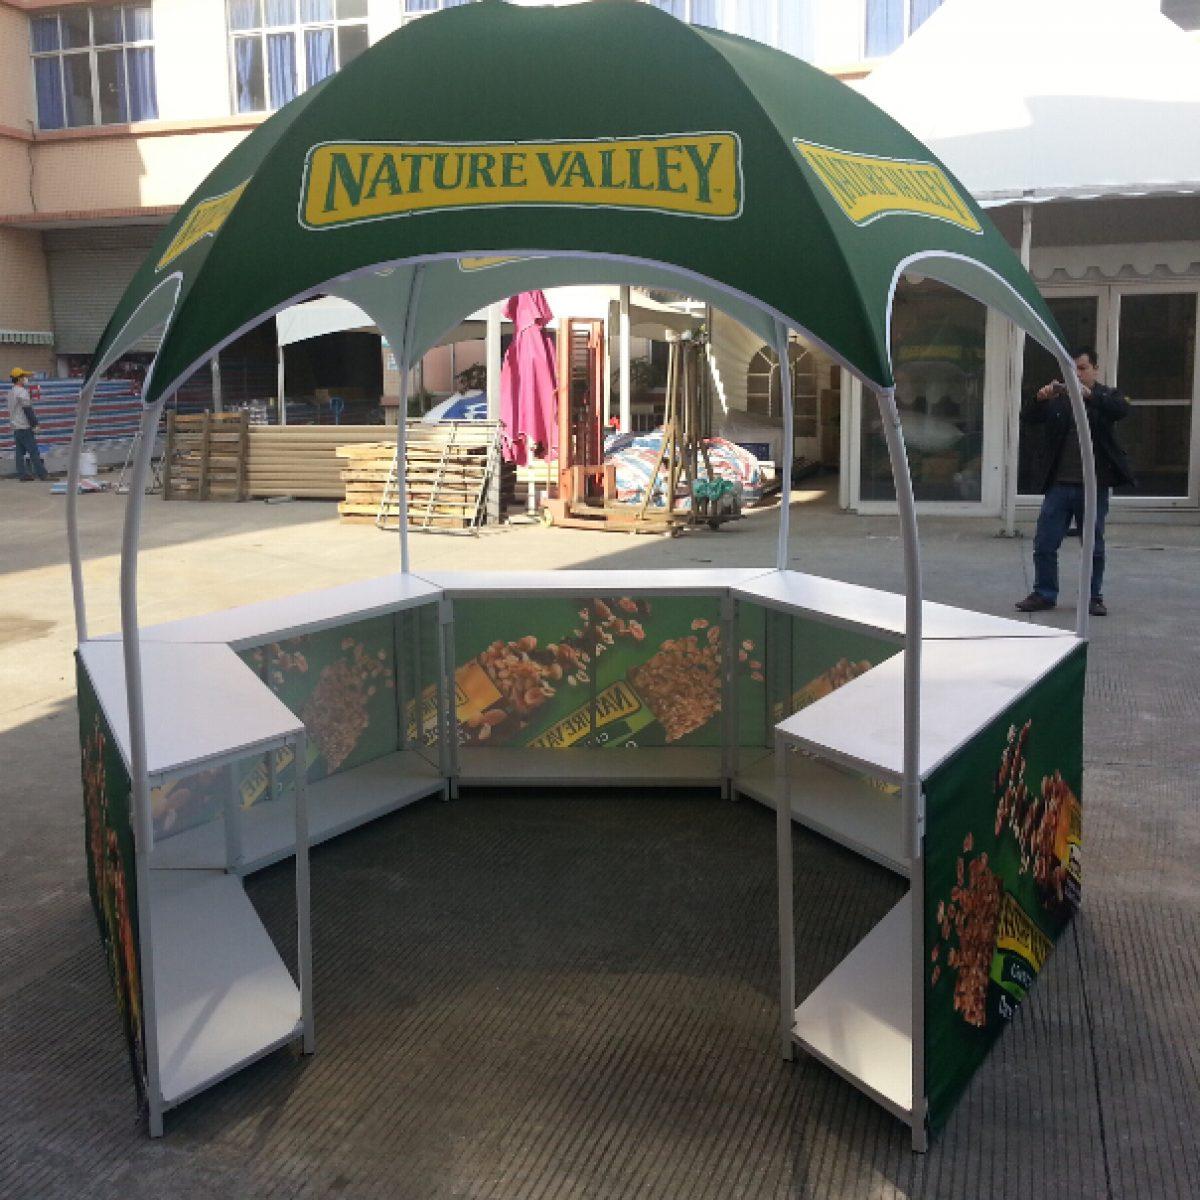 2) Outdoor Archway Deluxe Tent